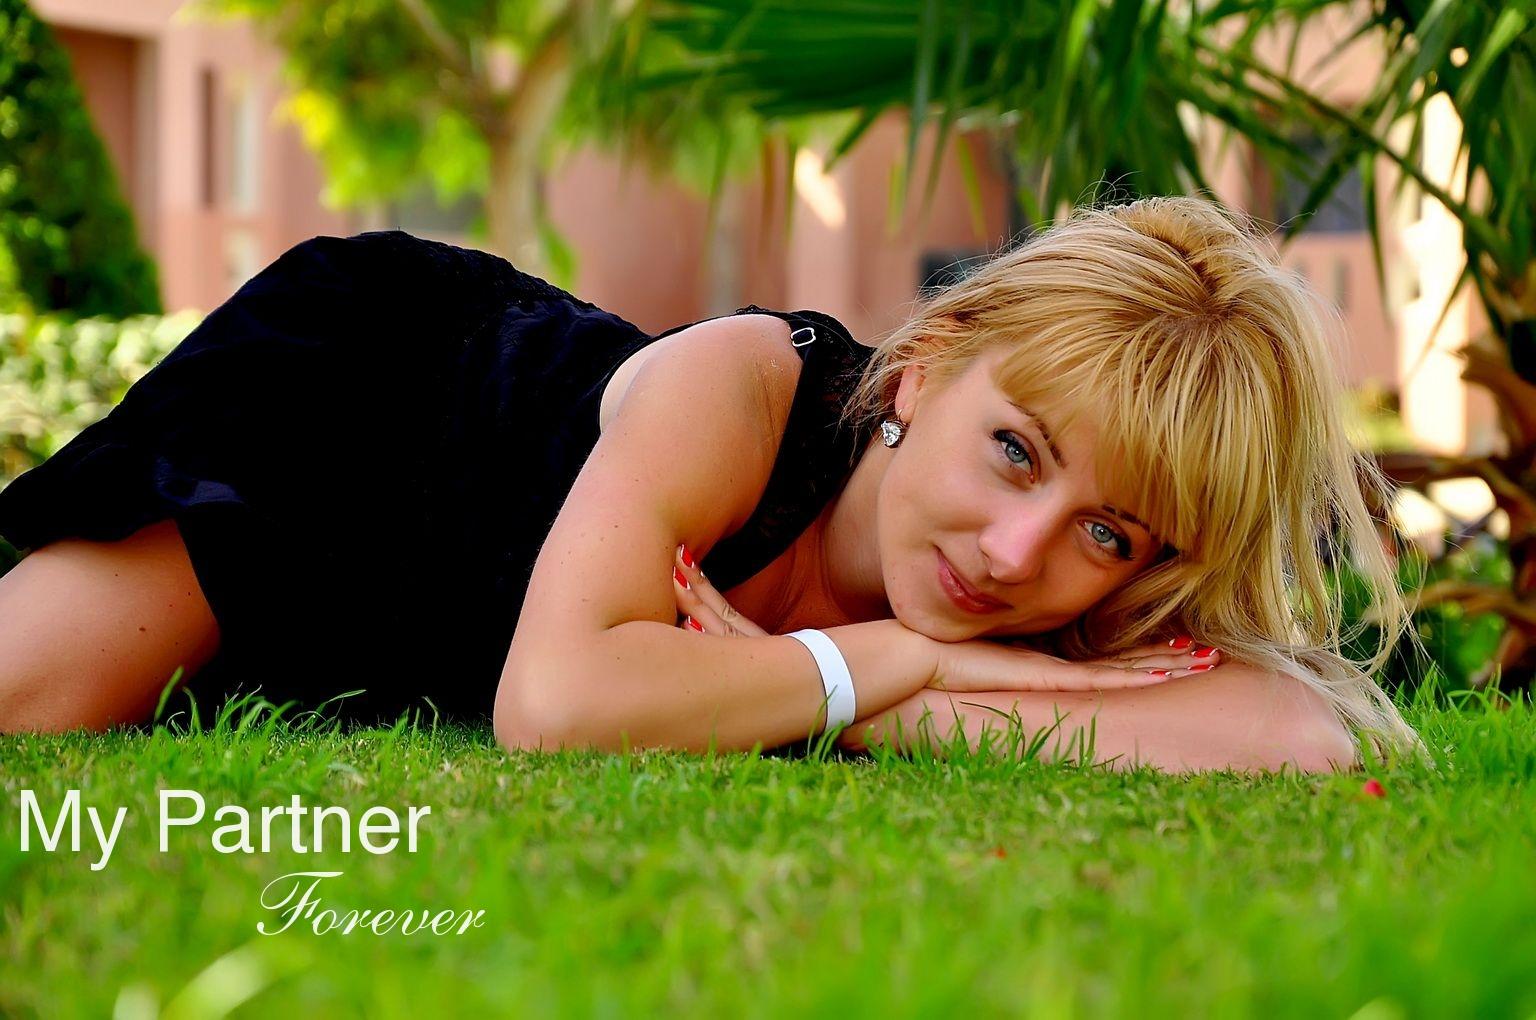 Dating Site to Meet Sexy Ukrainian Girl Marina from Kharkov, Ukraine